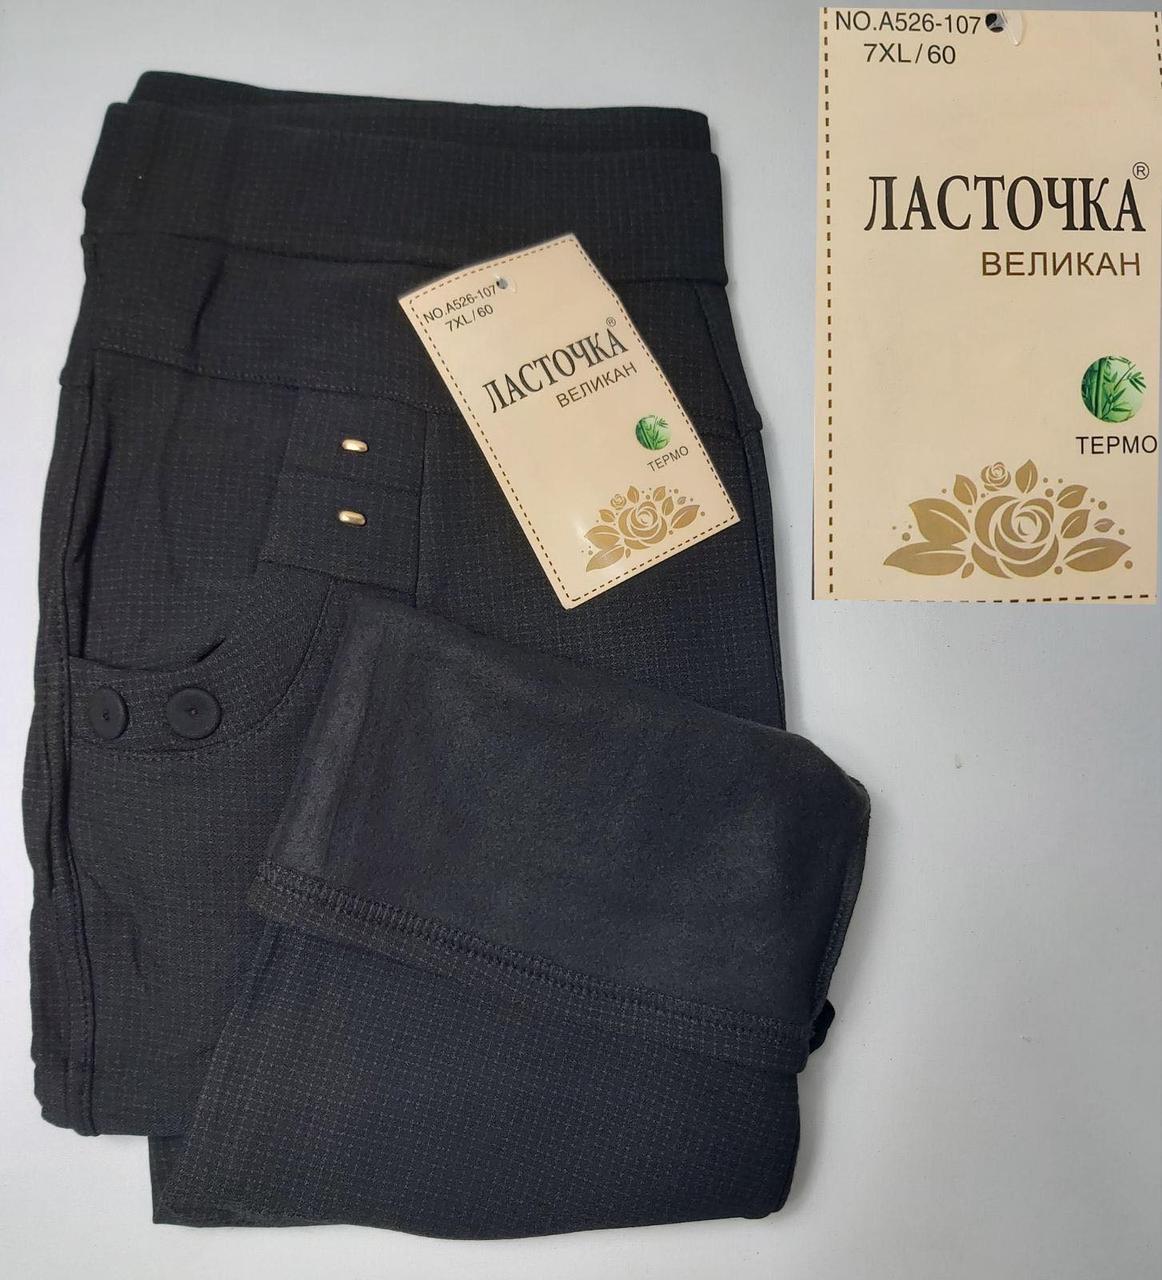 Брюки женские термо бамбук Ласточка 54-60 (6 шт)